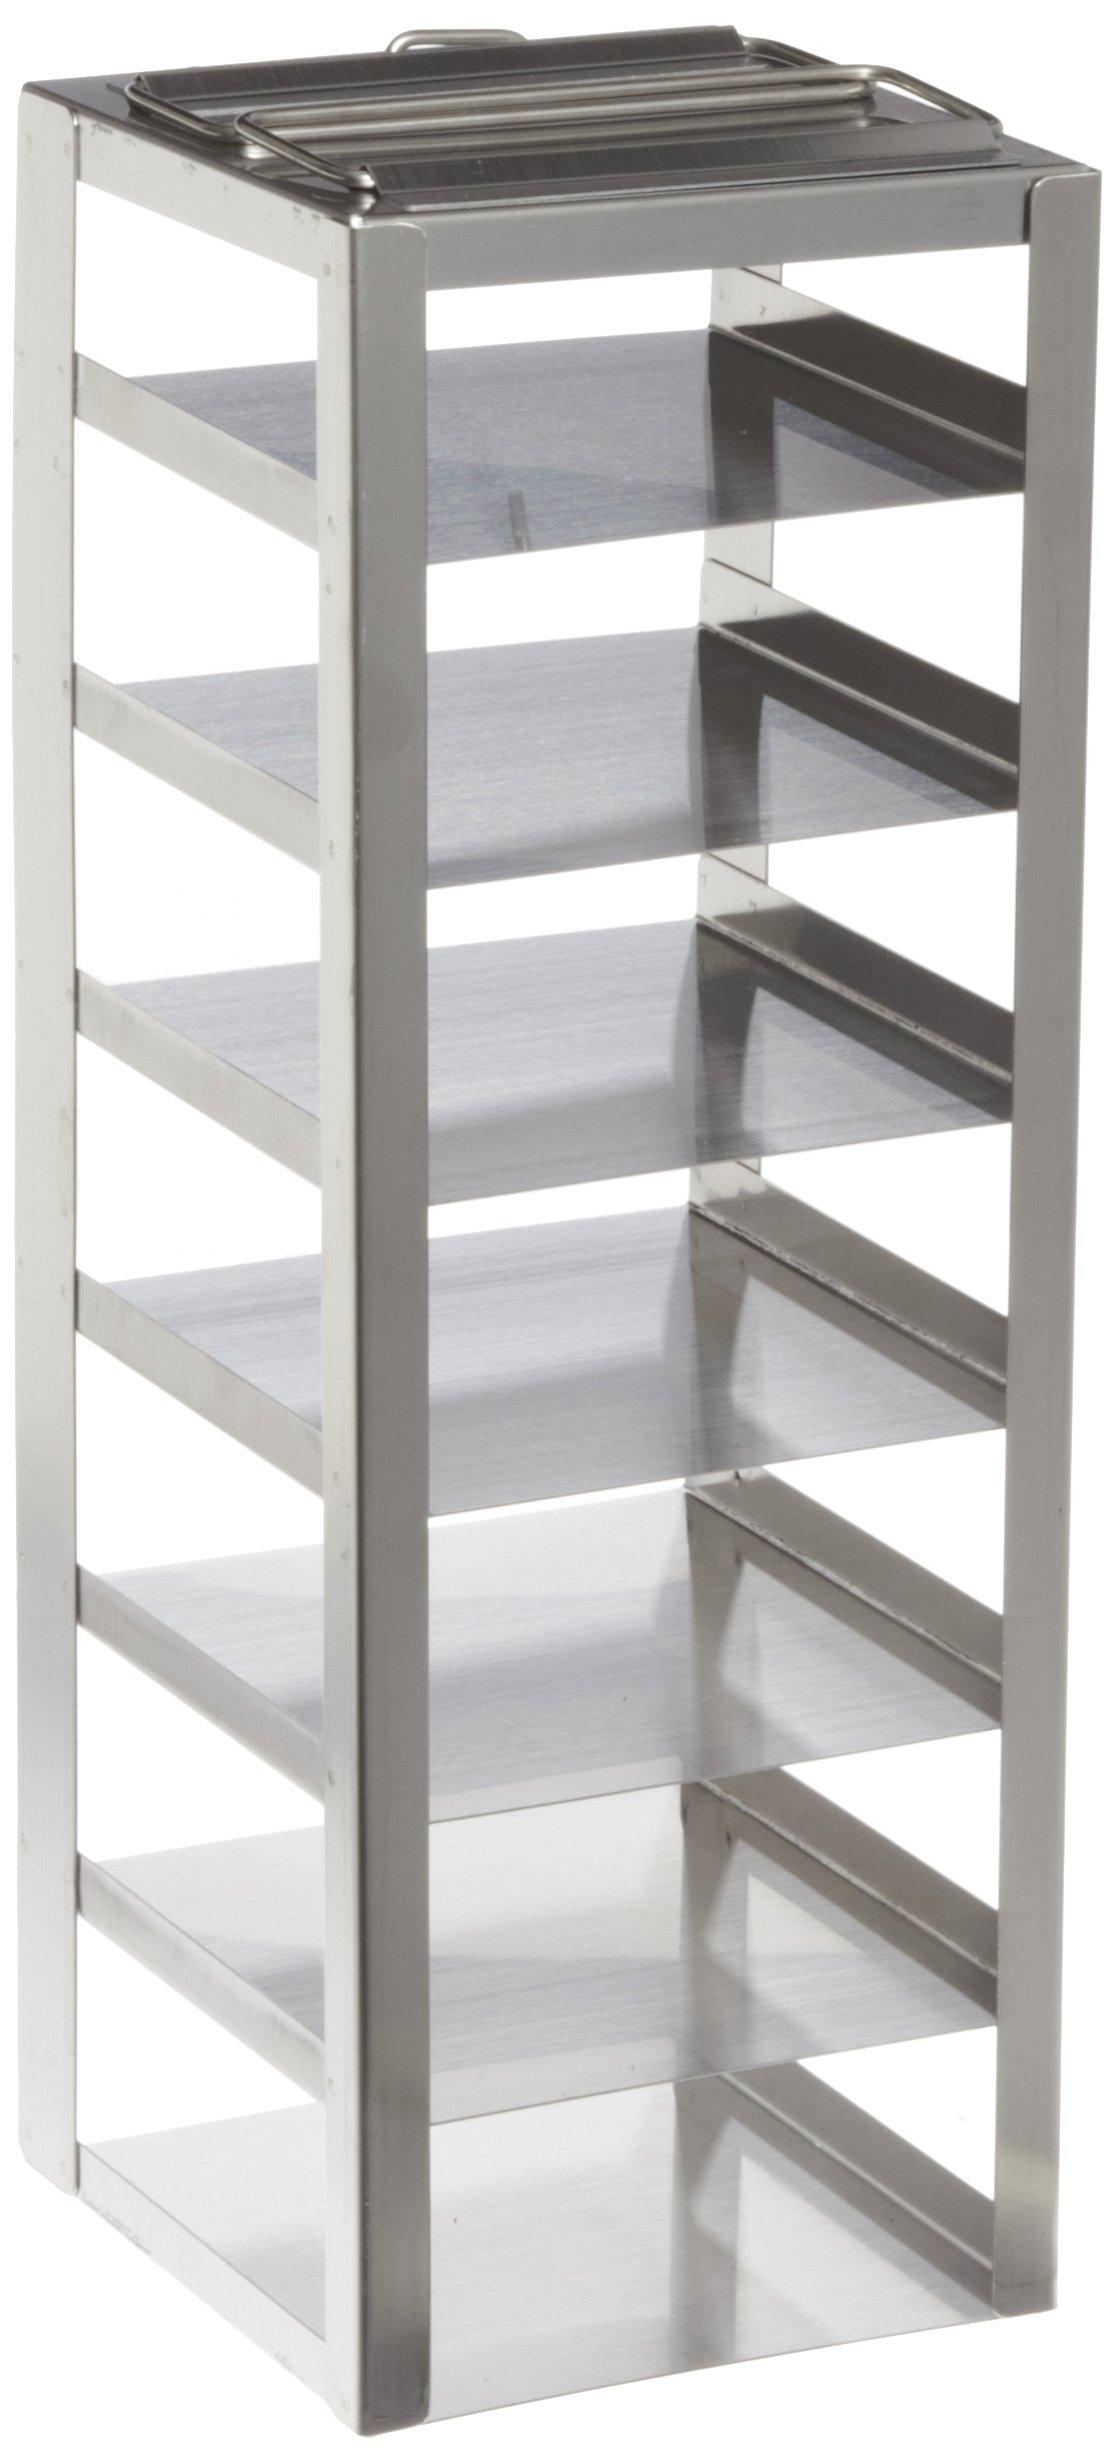 Heathrow Scientific HS2862AB Freezer Rack, Chest Freezer Rack, Vertical Freezer Rack, Stainless Steel, 7 Shelves, 2'' Box Height